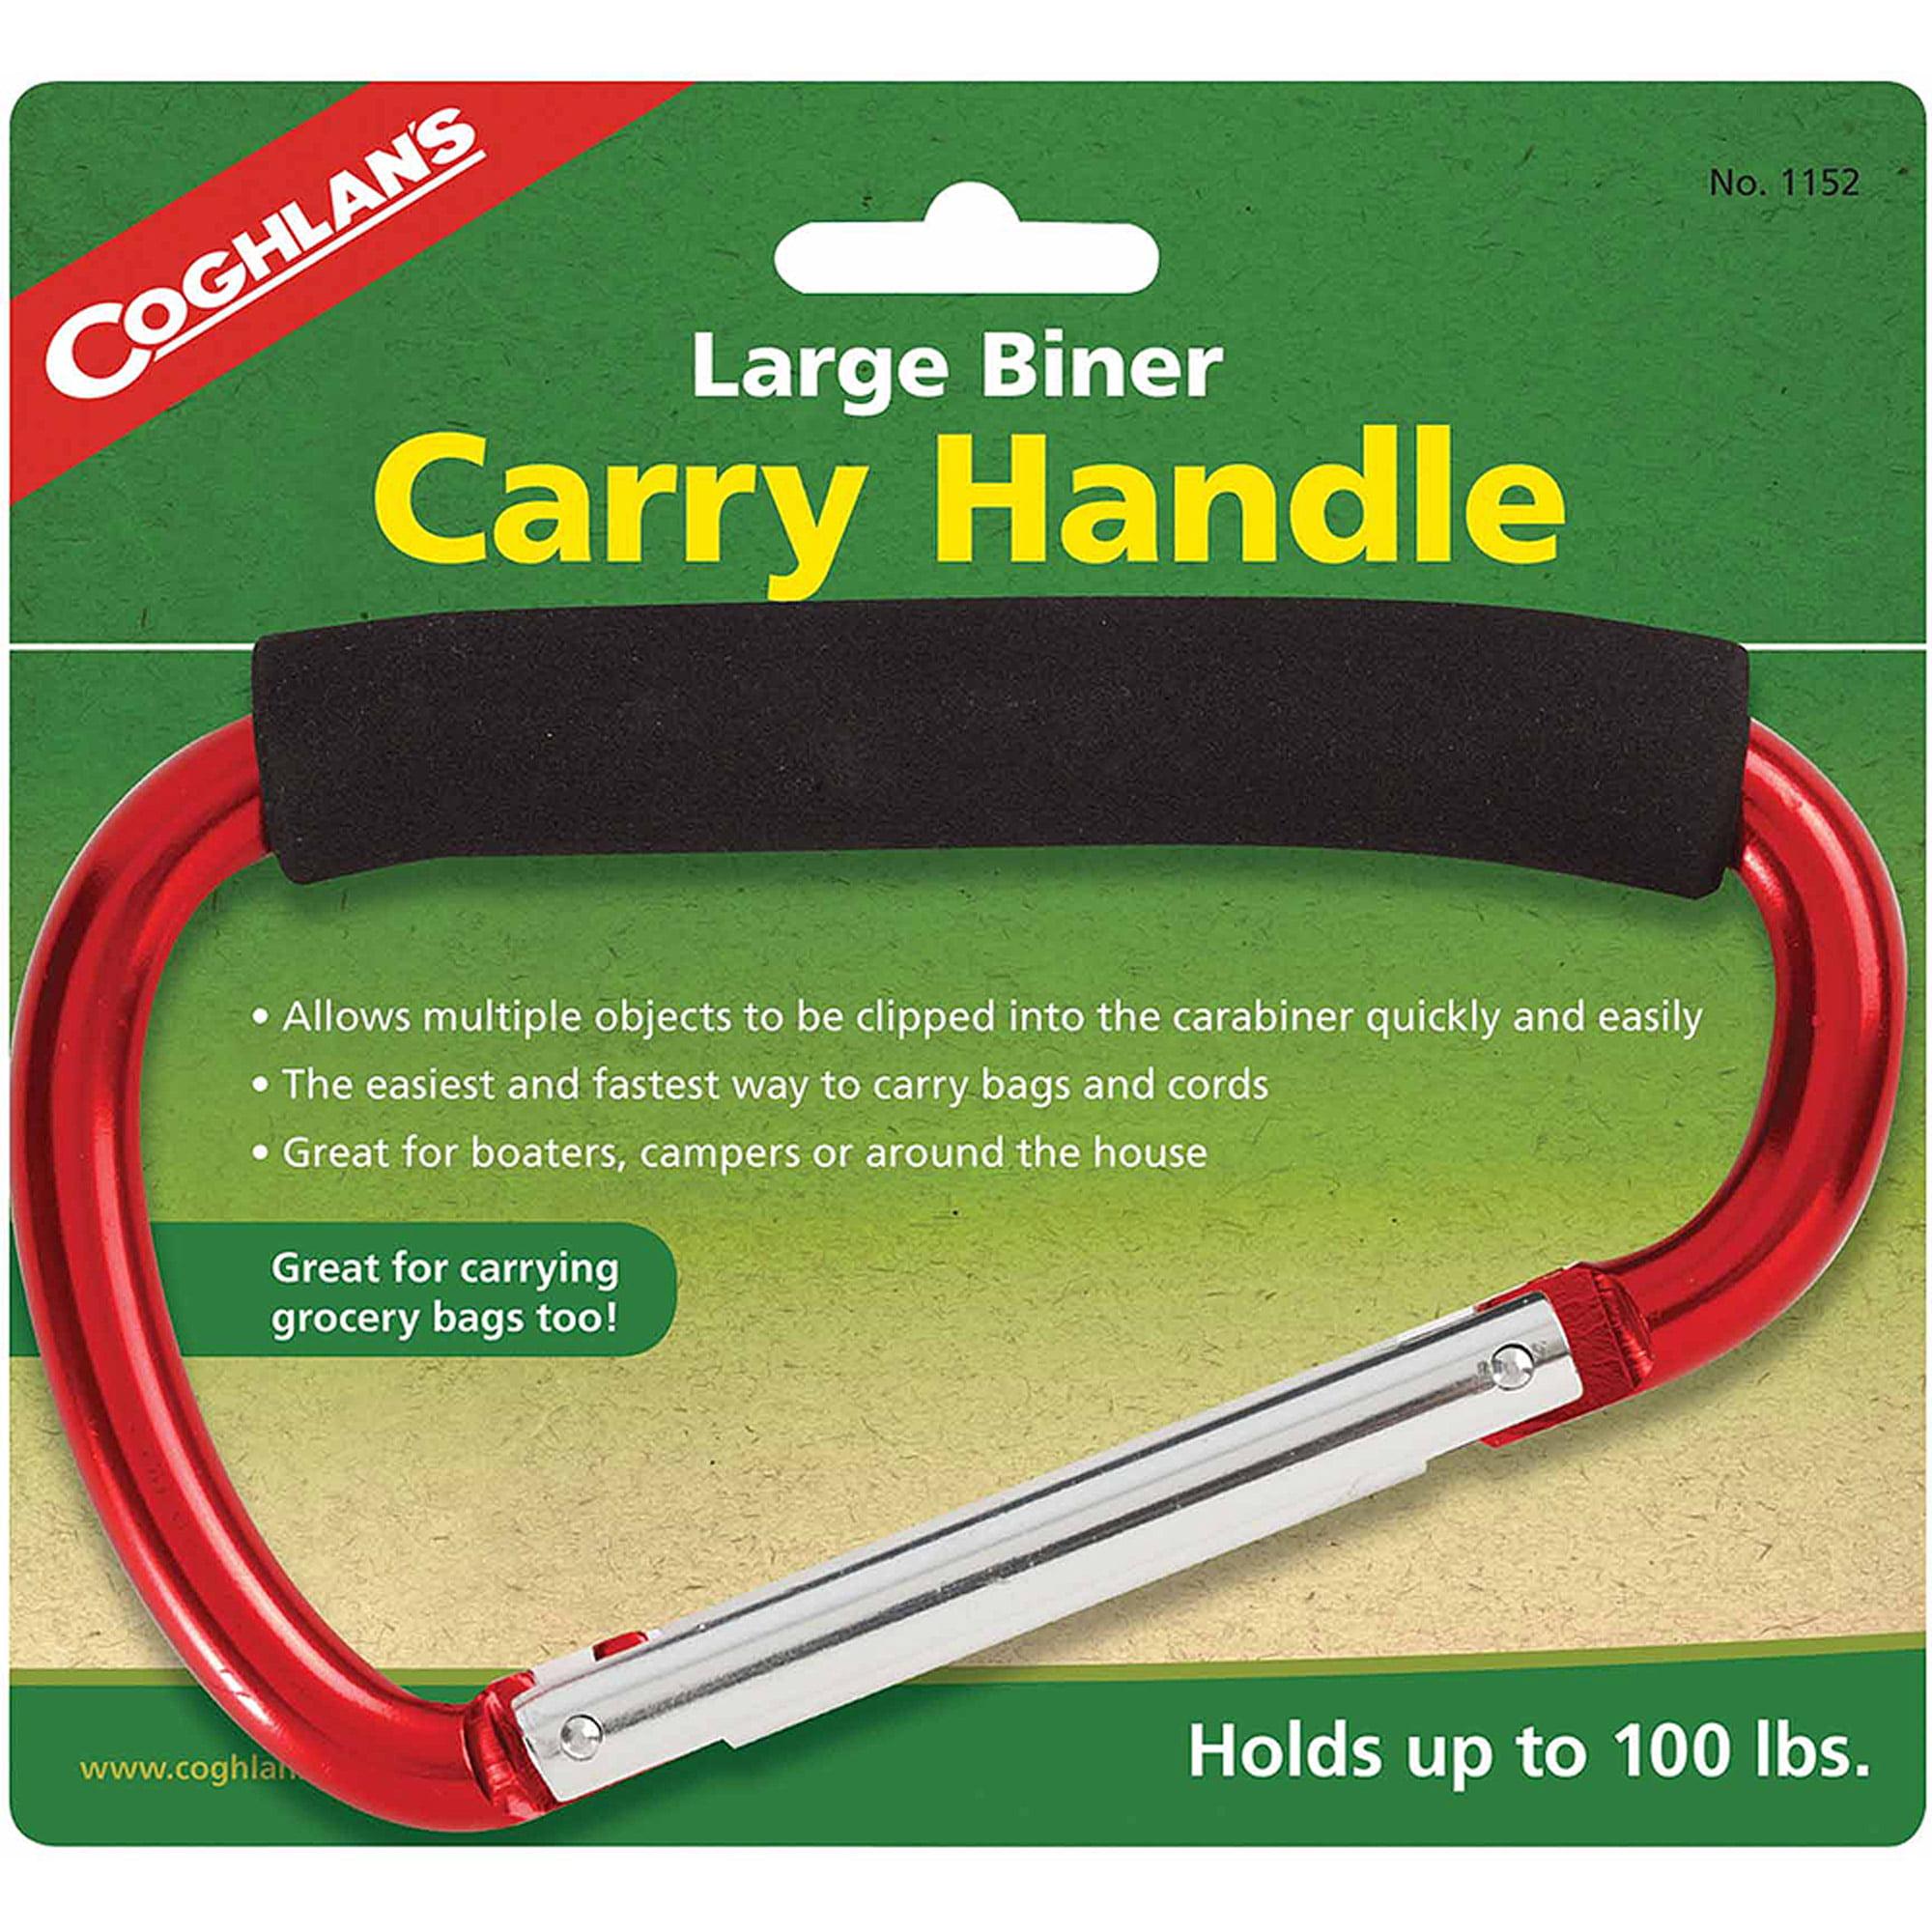 Coghlan's 1152 Large Biner Carry Handle